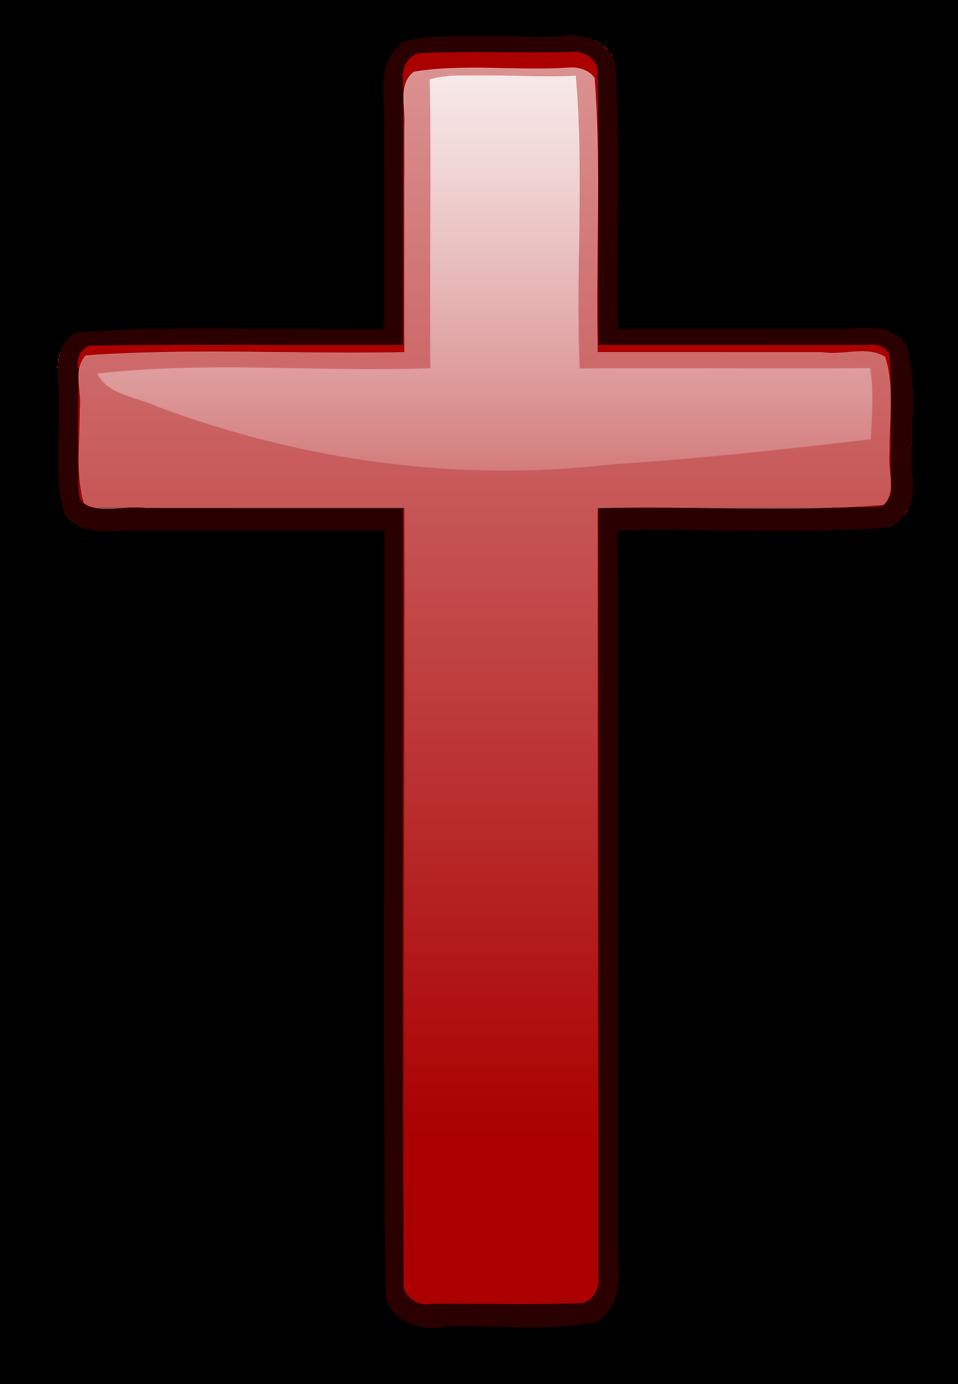 Christian Cross PNG File - Christian PNG HD Crosses